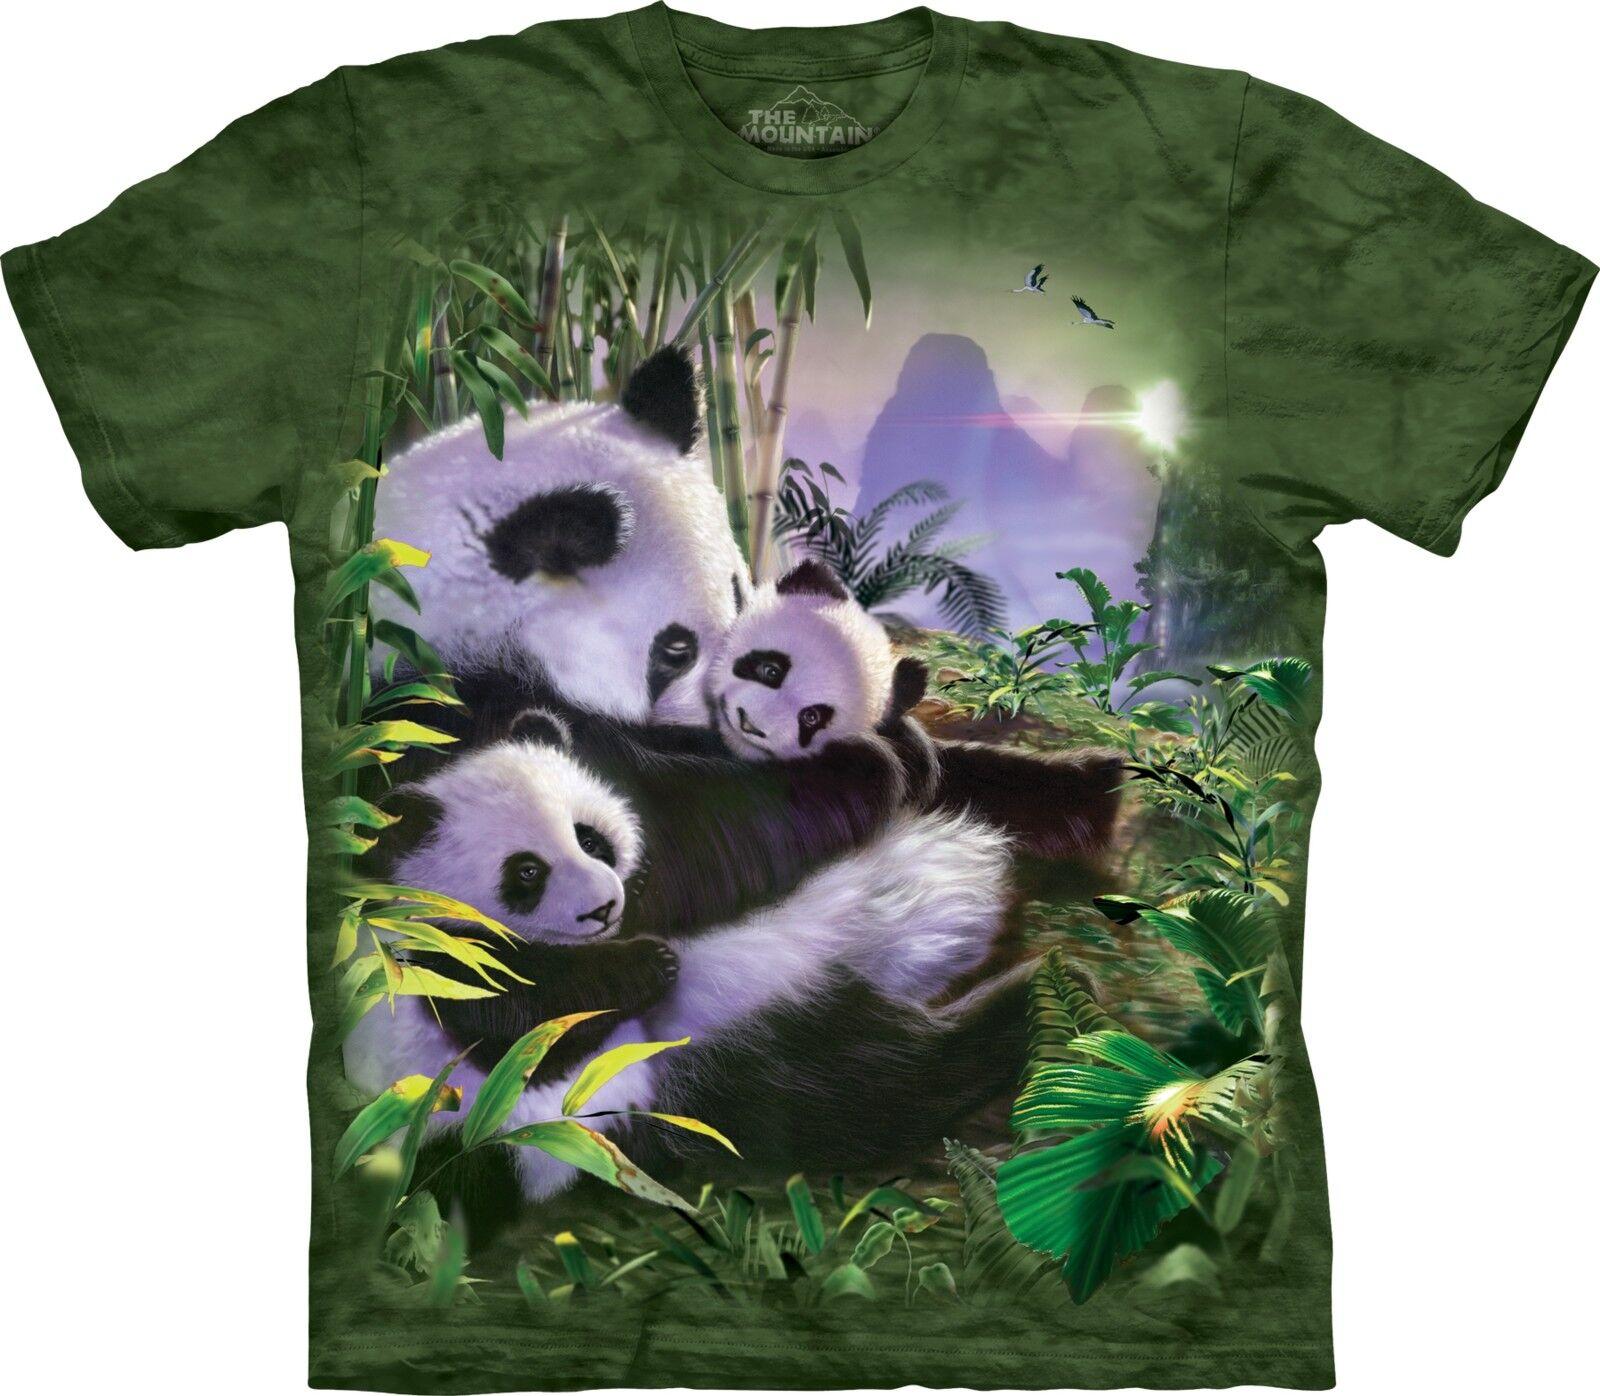 The Mountain Unisex Adult Panda Cuddles Animal T Shirt